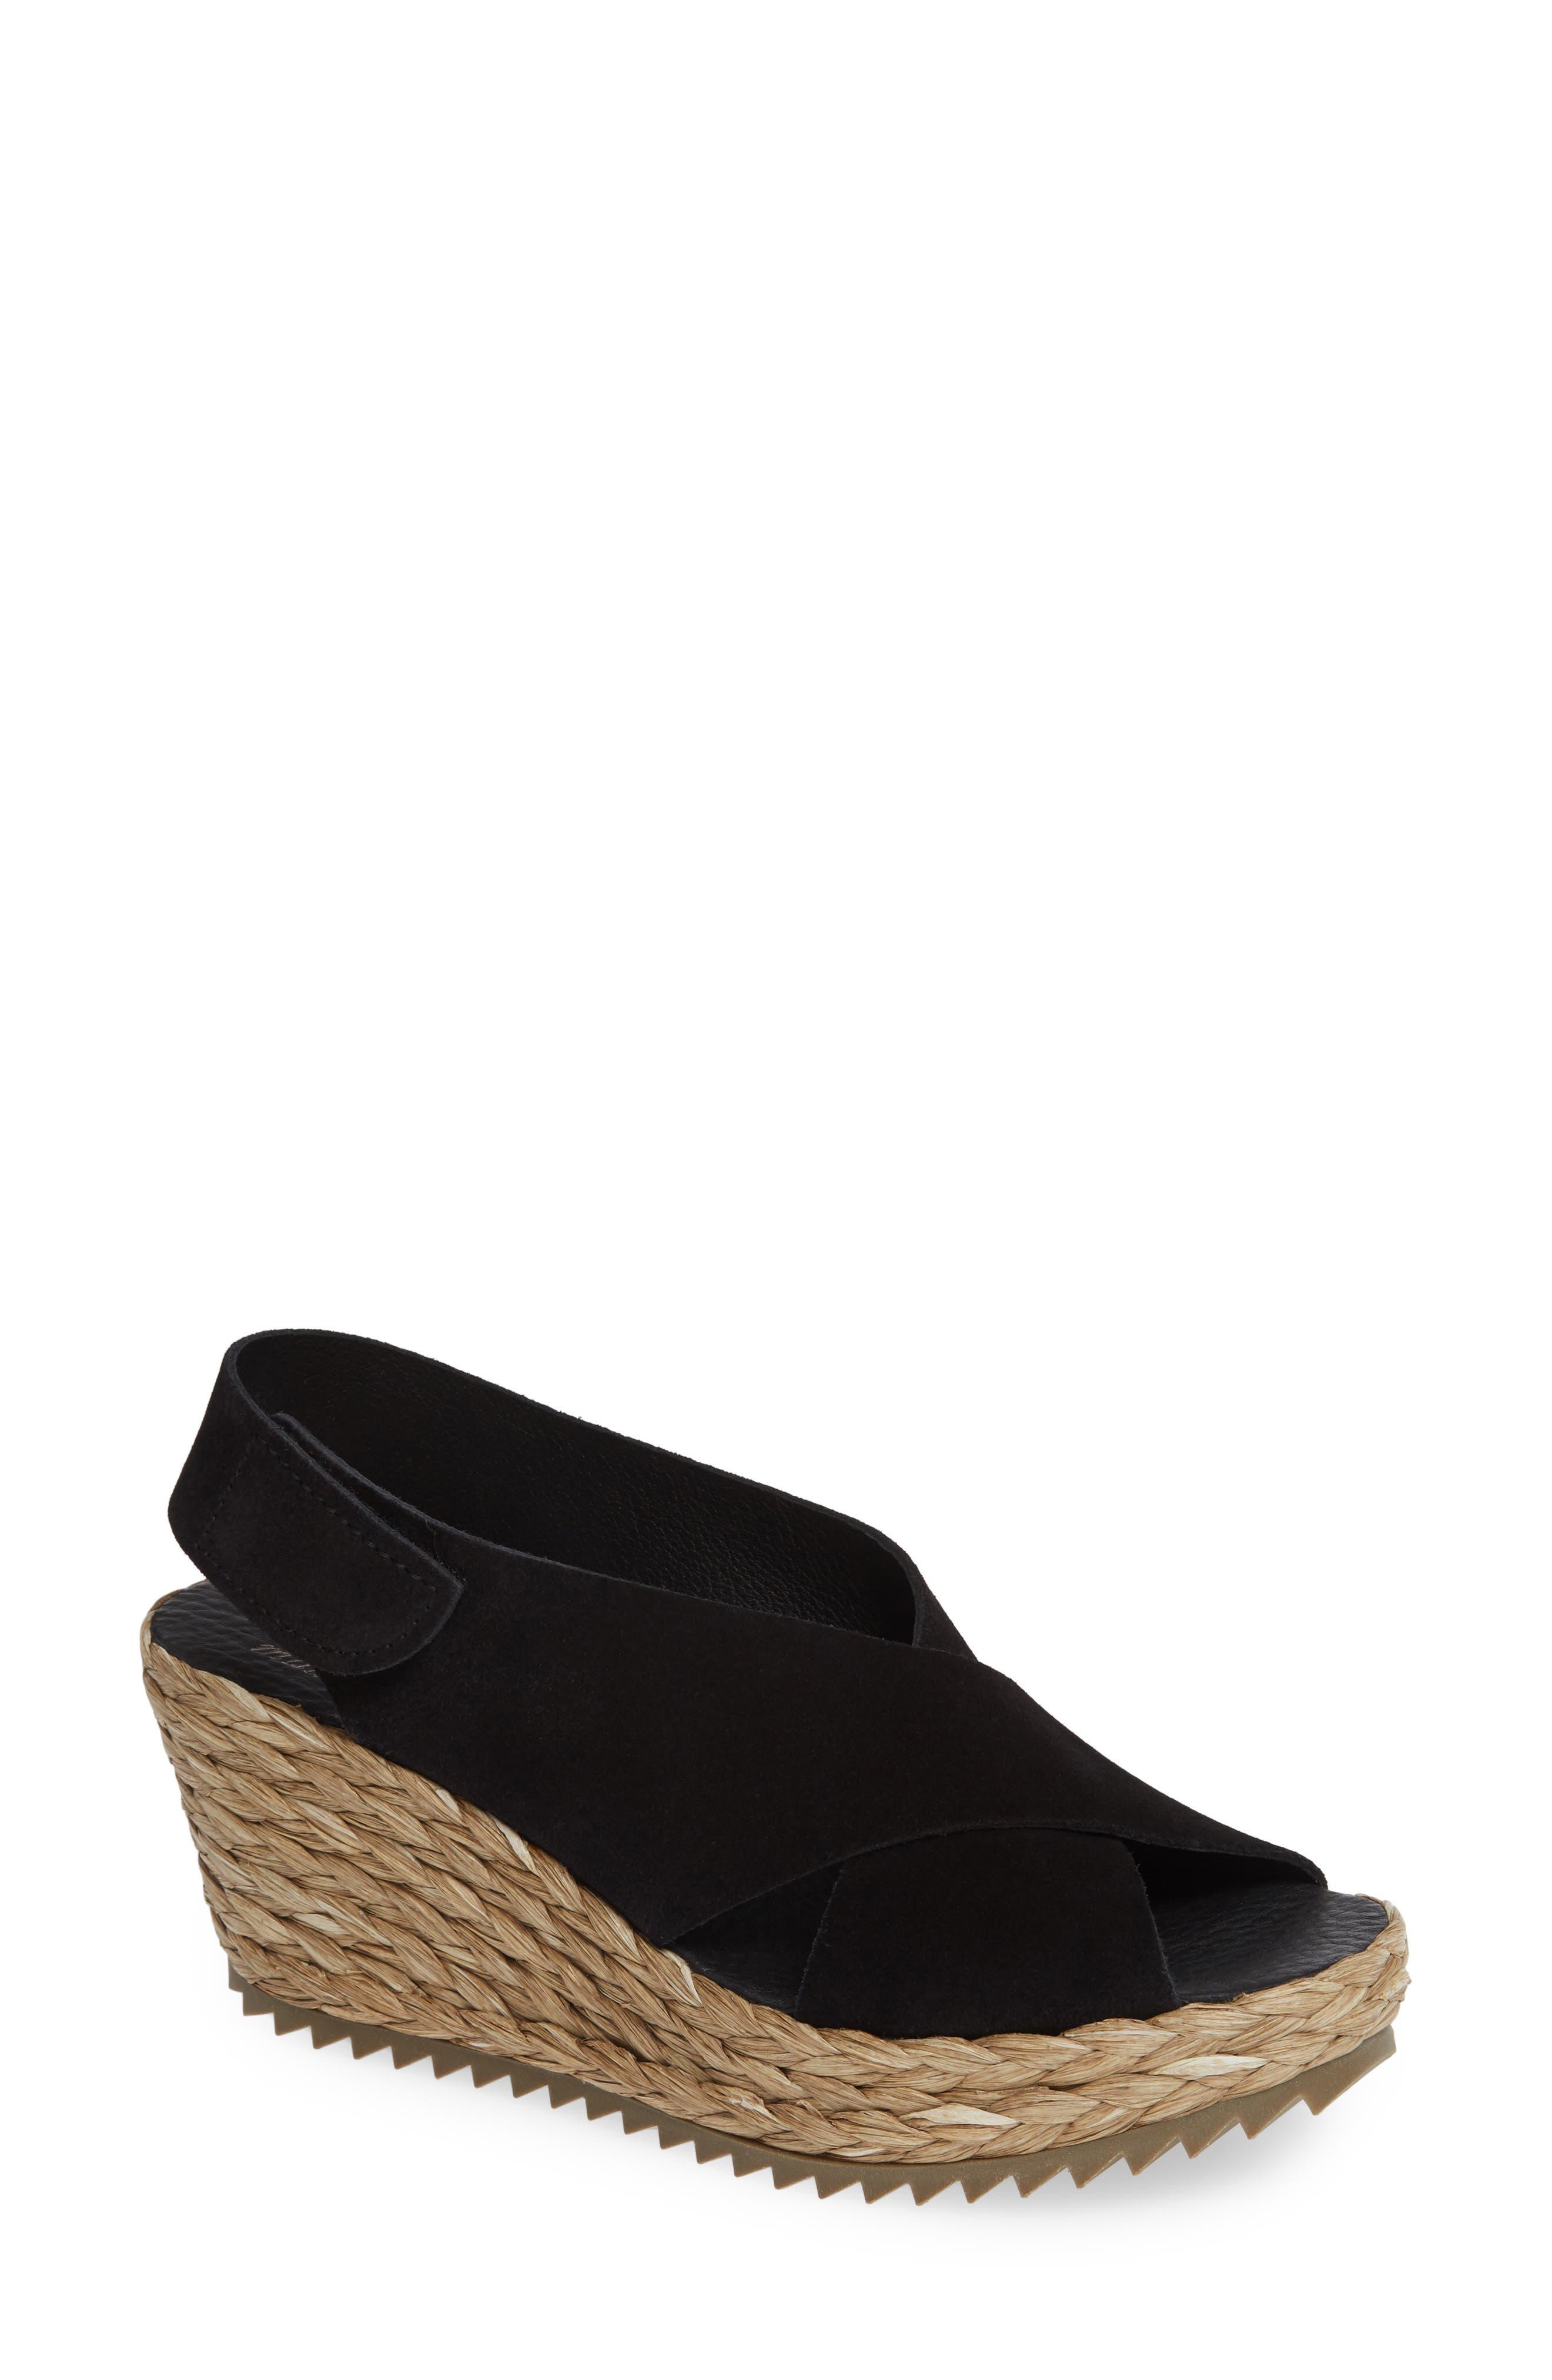 'Federica' Wedge Sandal,                             Main thumbnail 1, color,                             BLACK CASTORO/ RAFFIA